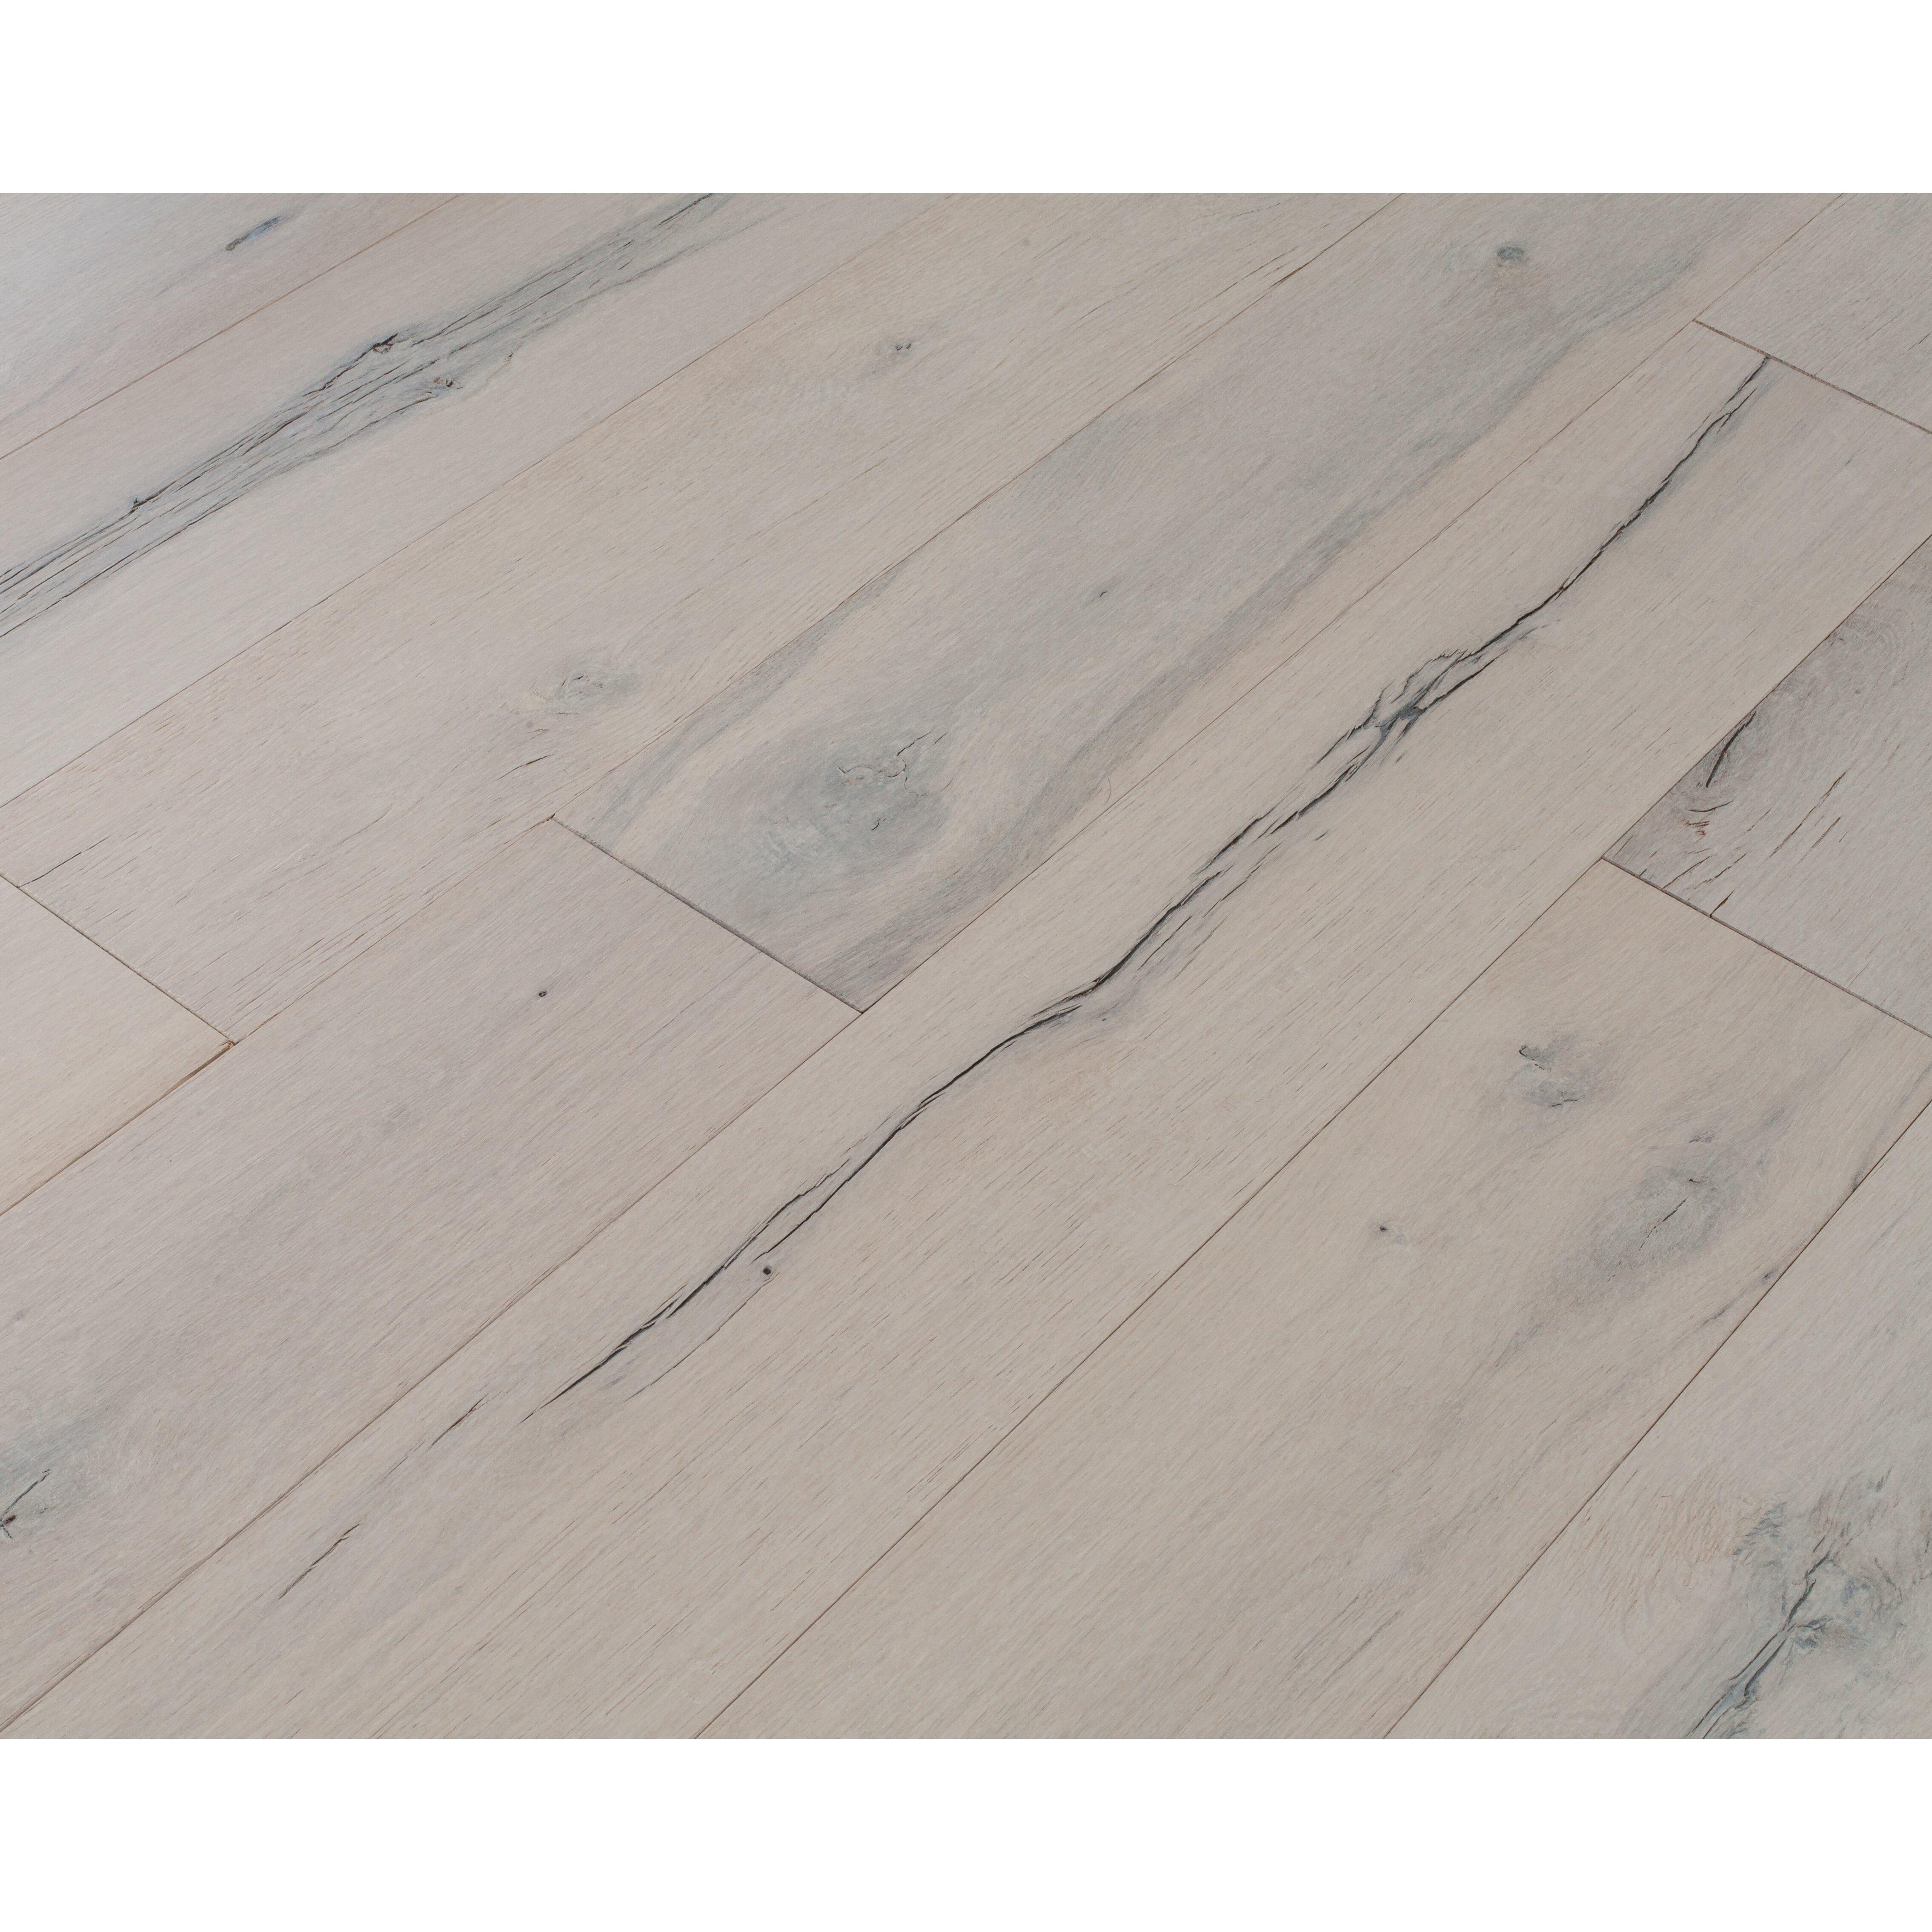 Eddie Bauer Floors Beach Cove White Oak 7 Inch Wide Plank